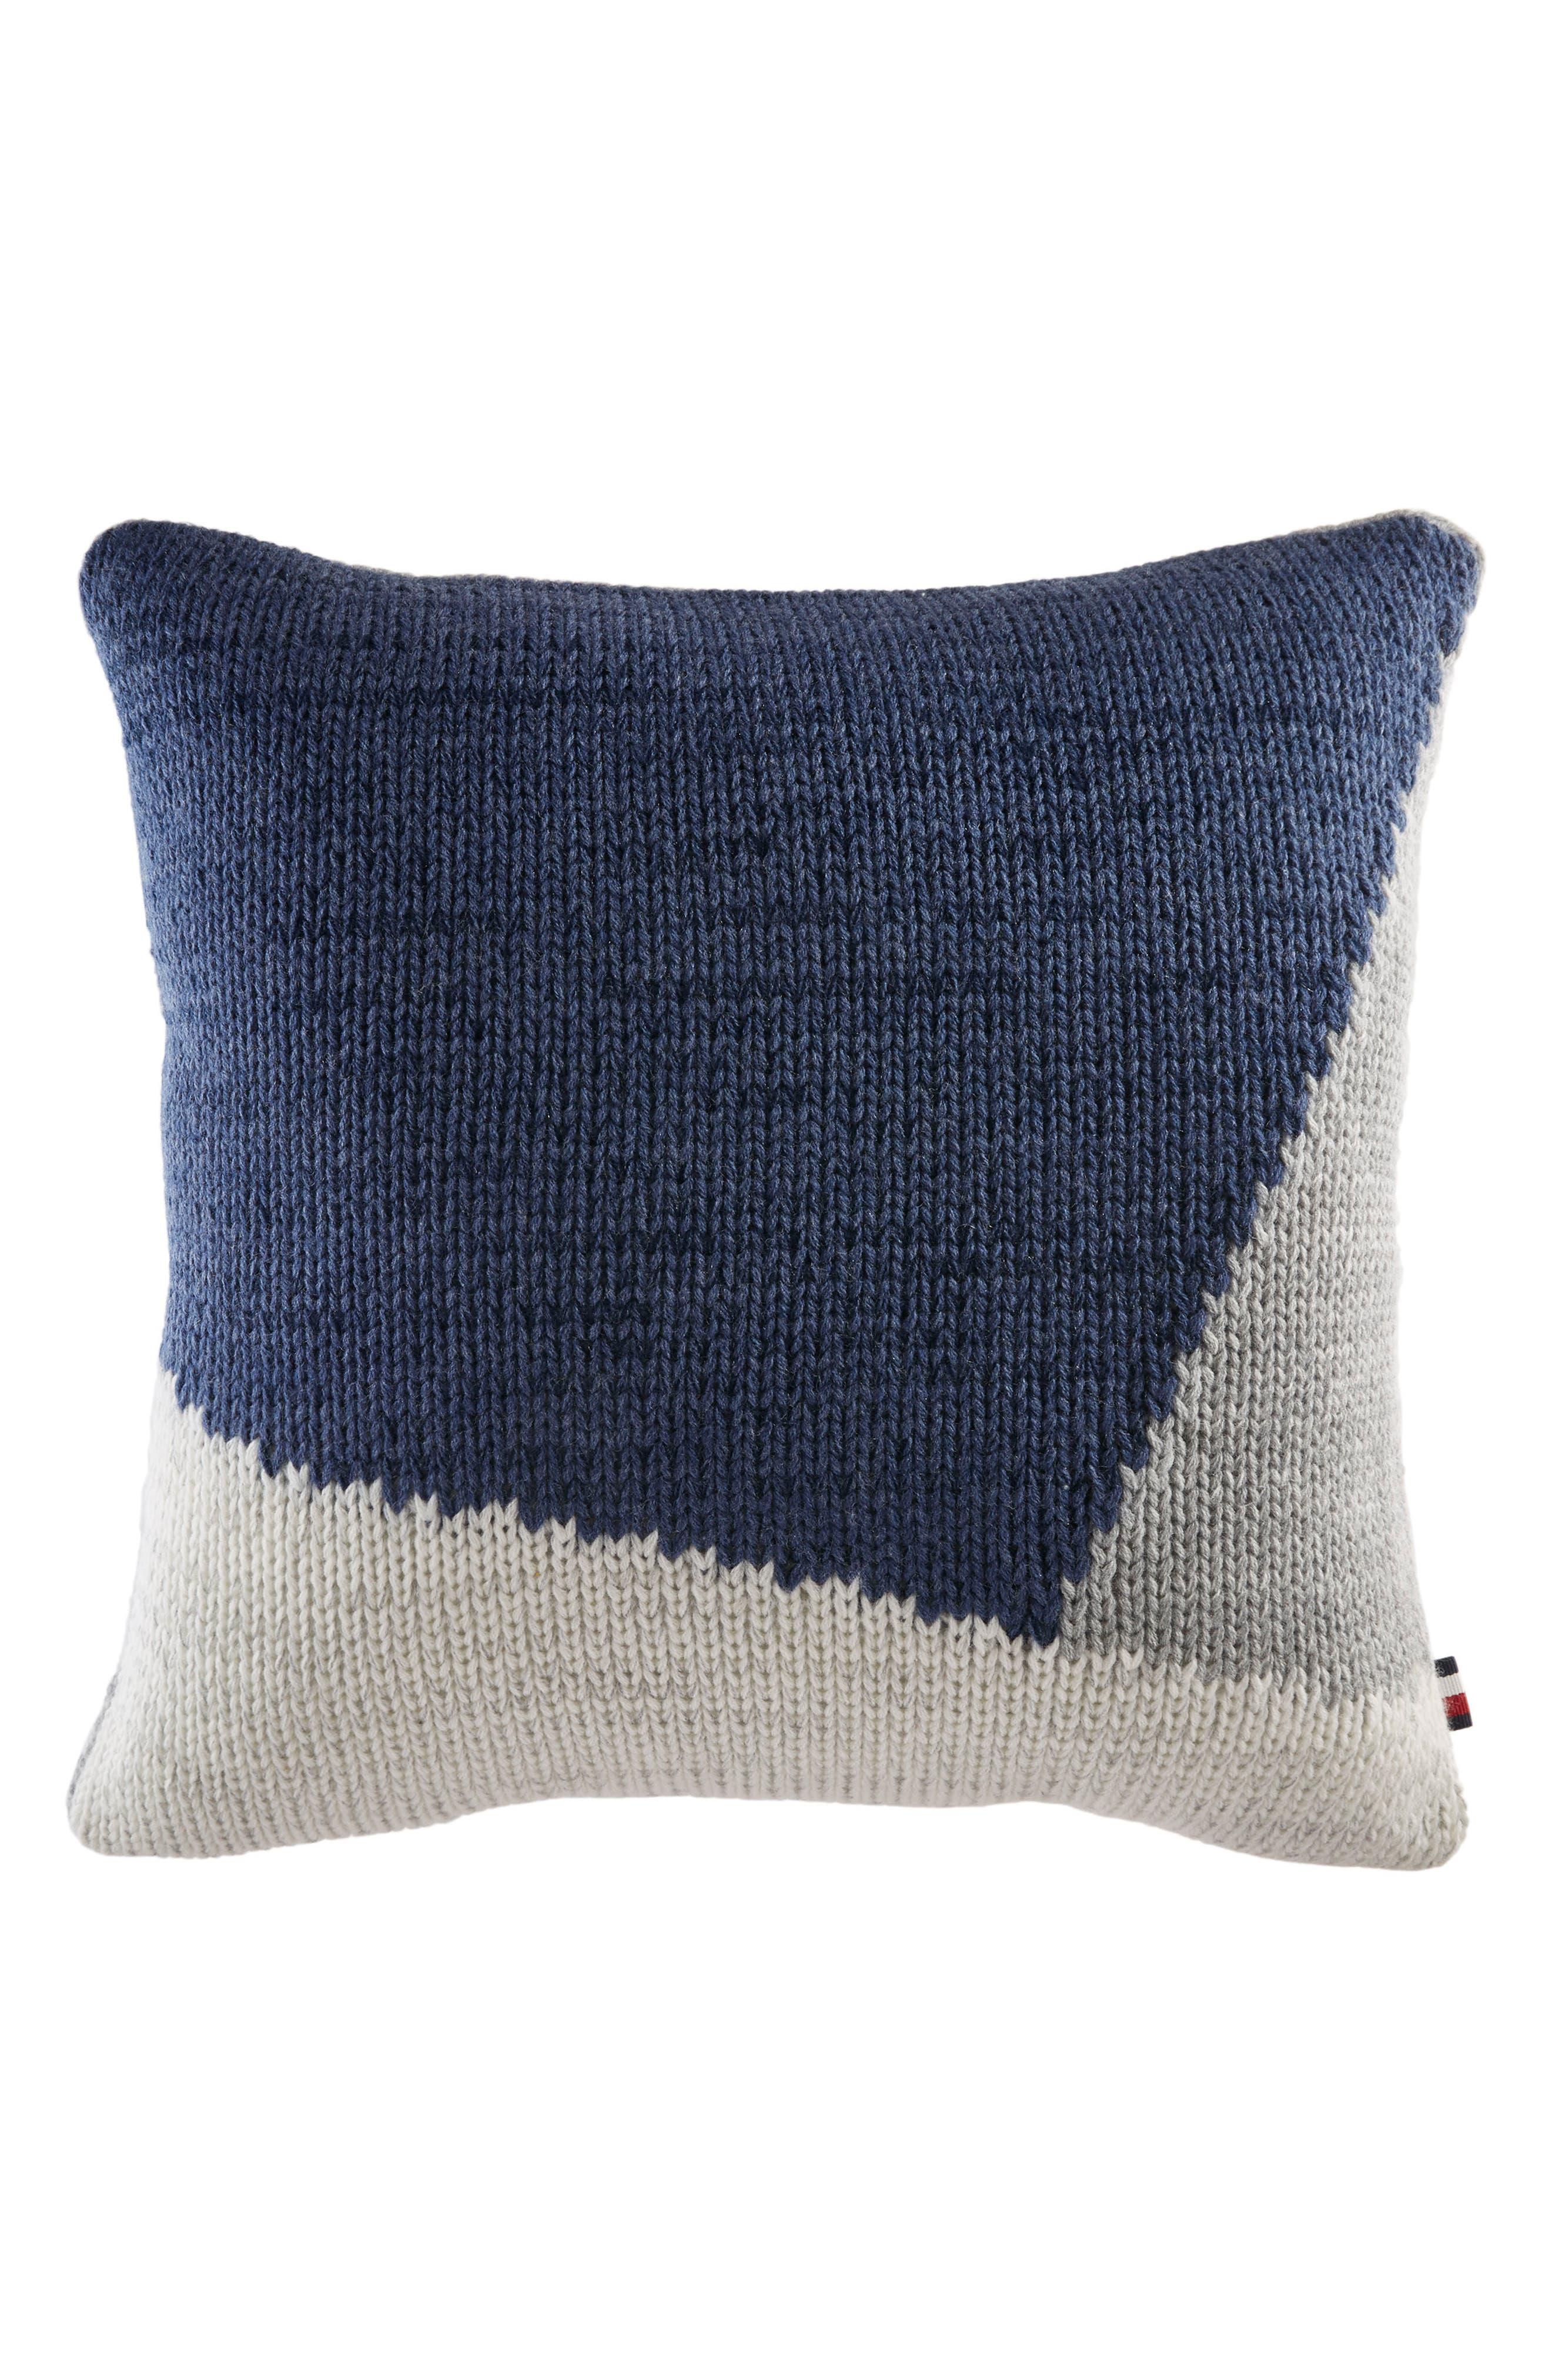 Colorblock Knit Accent Pillow,                             Main thumbnail 1, color,                             Blue/ Grey Multi